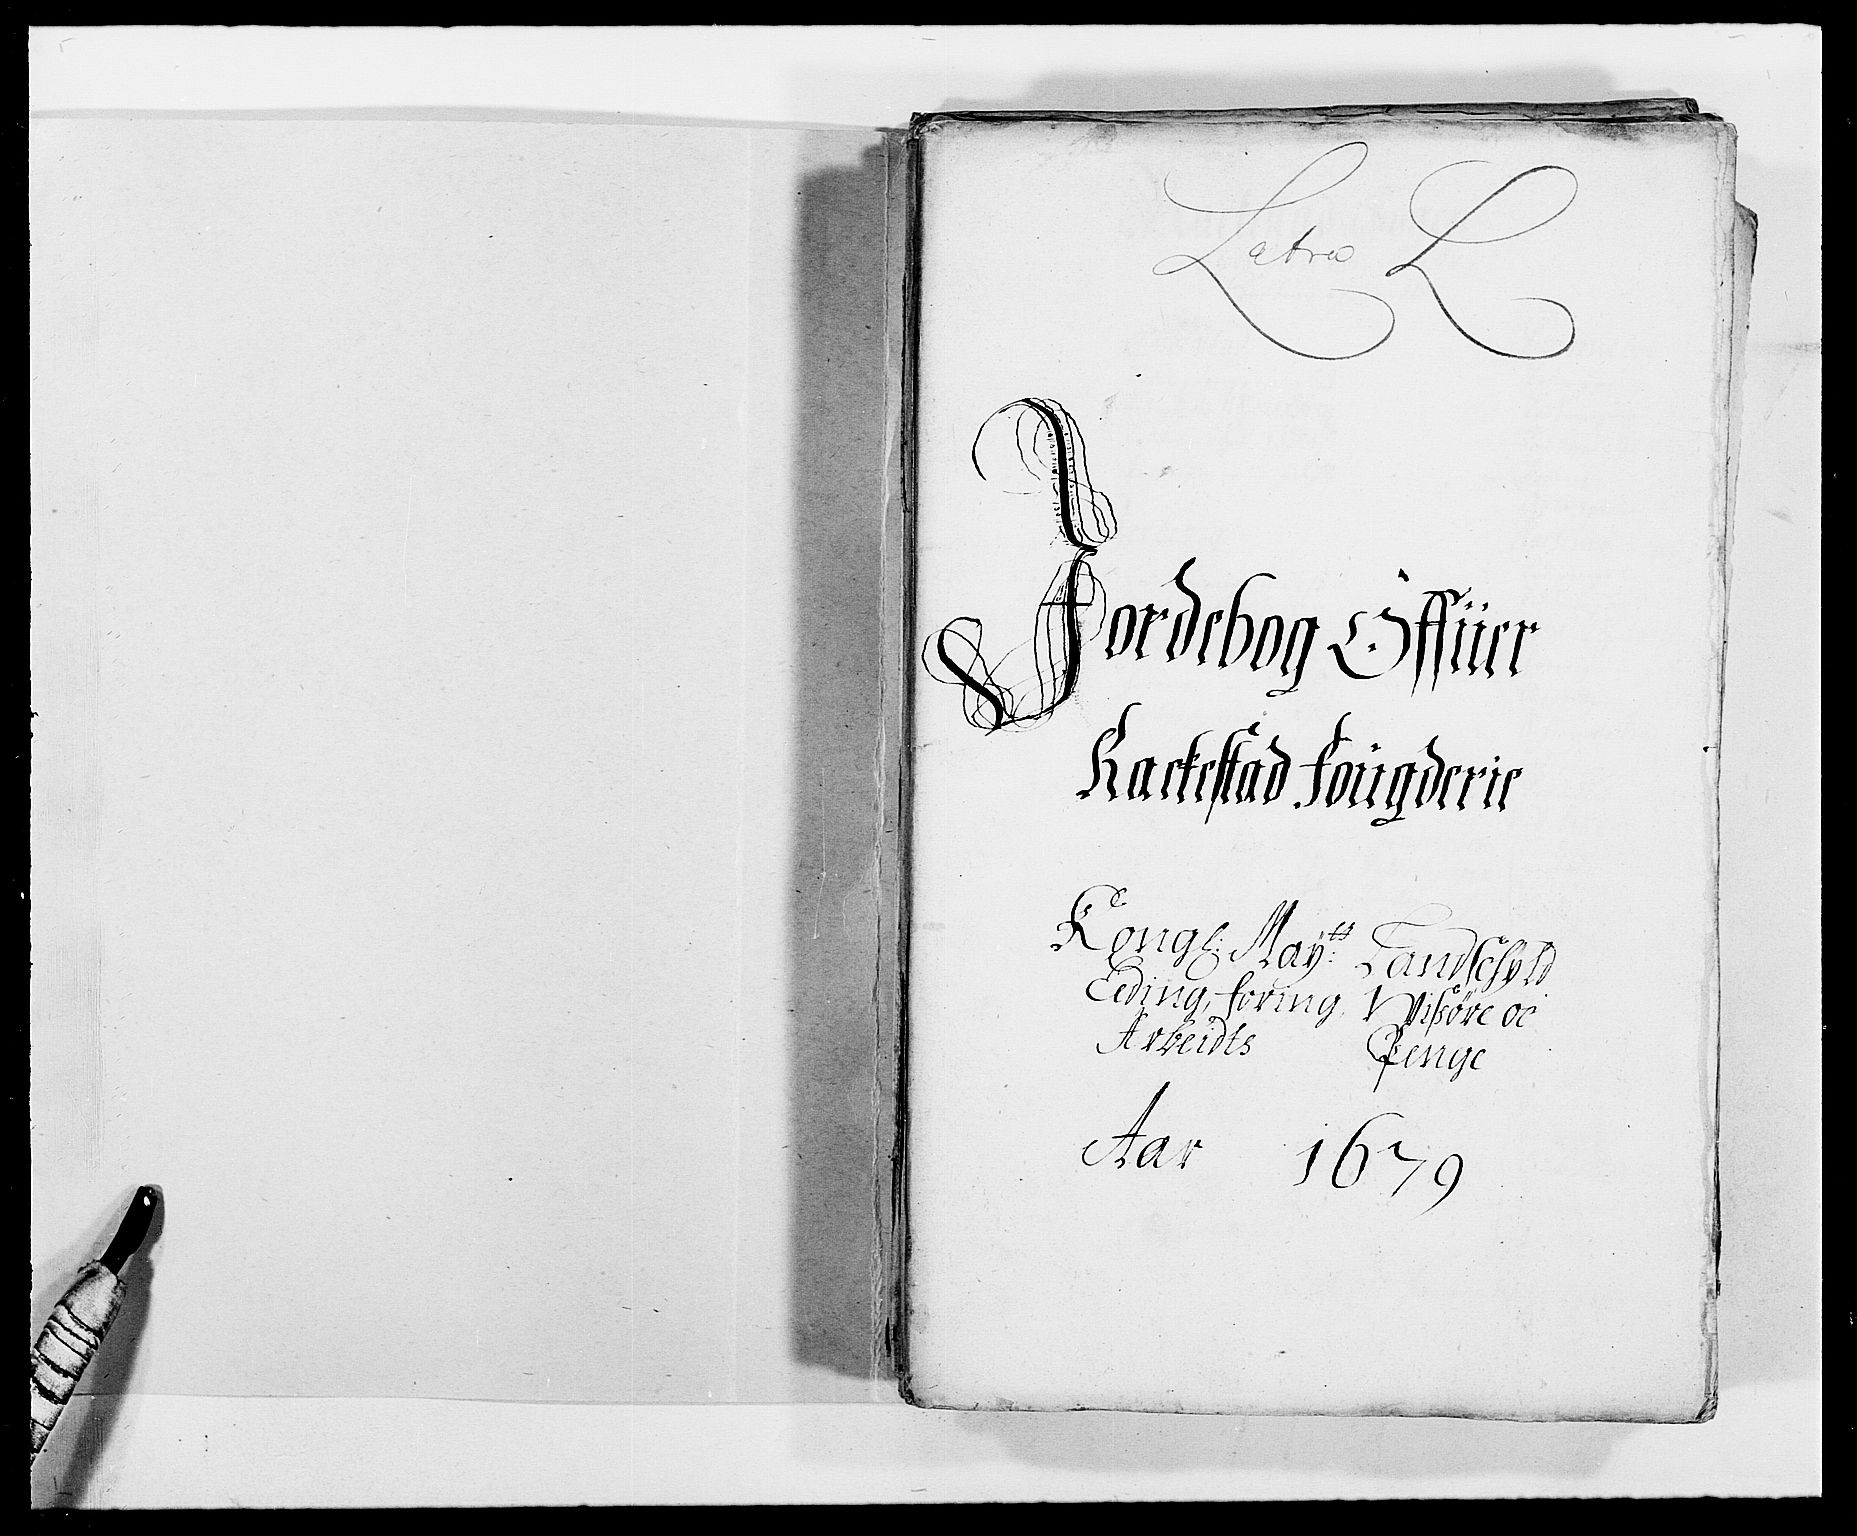 RA, Rentekammeret inntil 1814, Reviderte regnskaper, Fogderegnskap, R05/L0271: Fogderegnskap Rakkestad, 1678-1679, s. 254